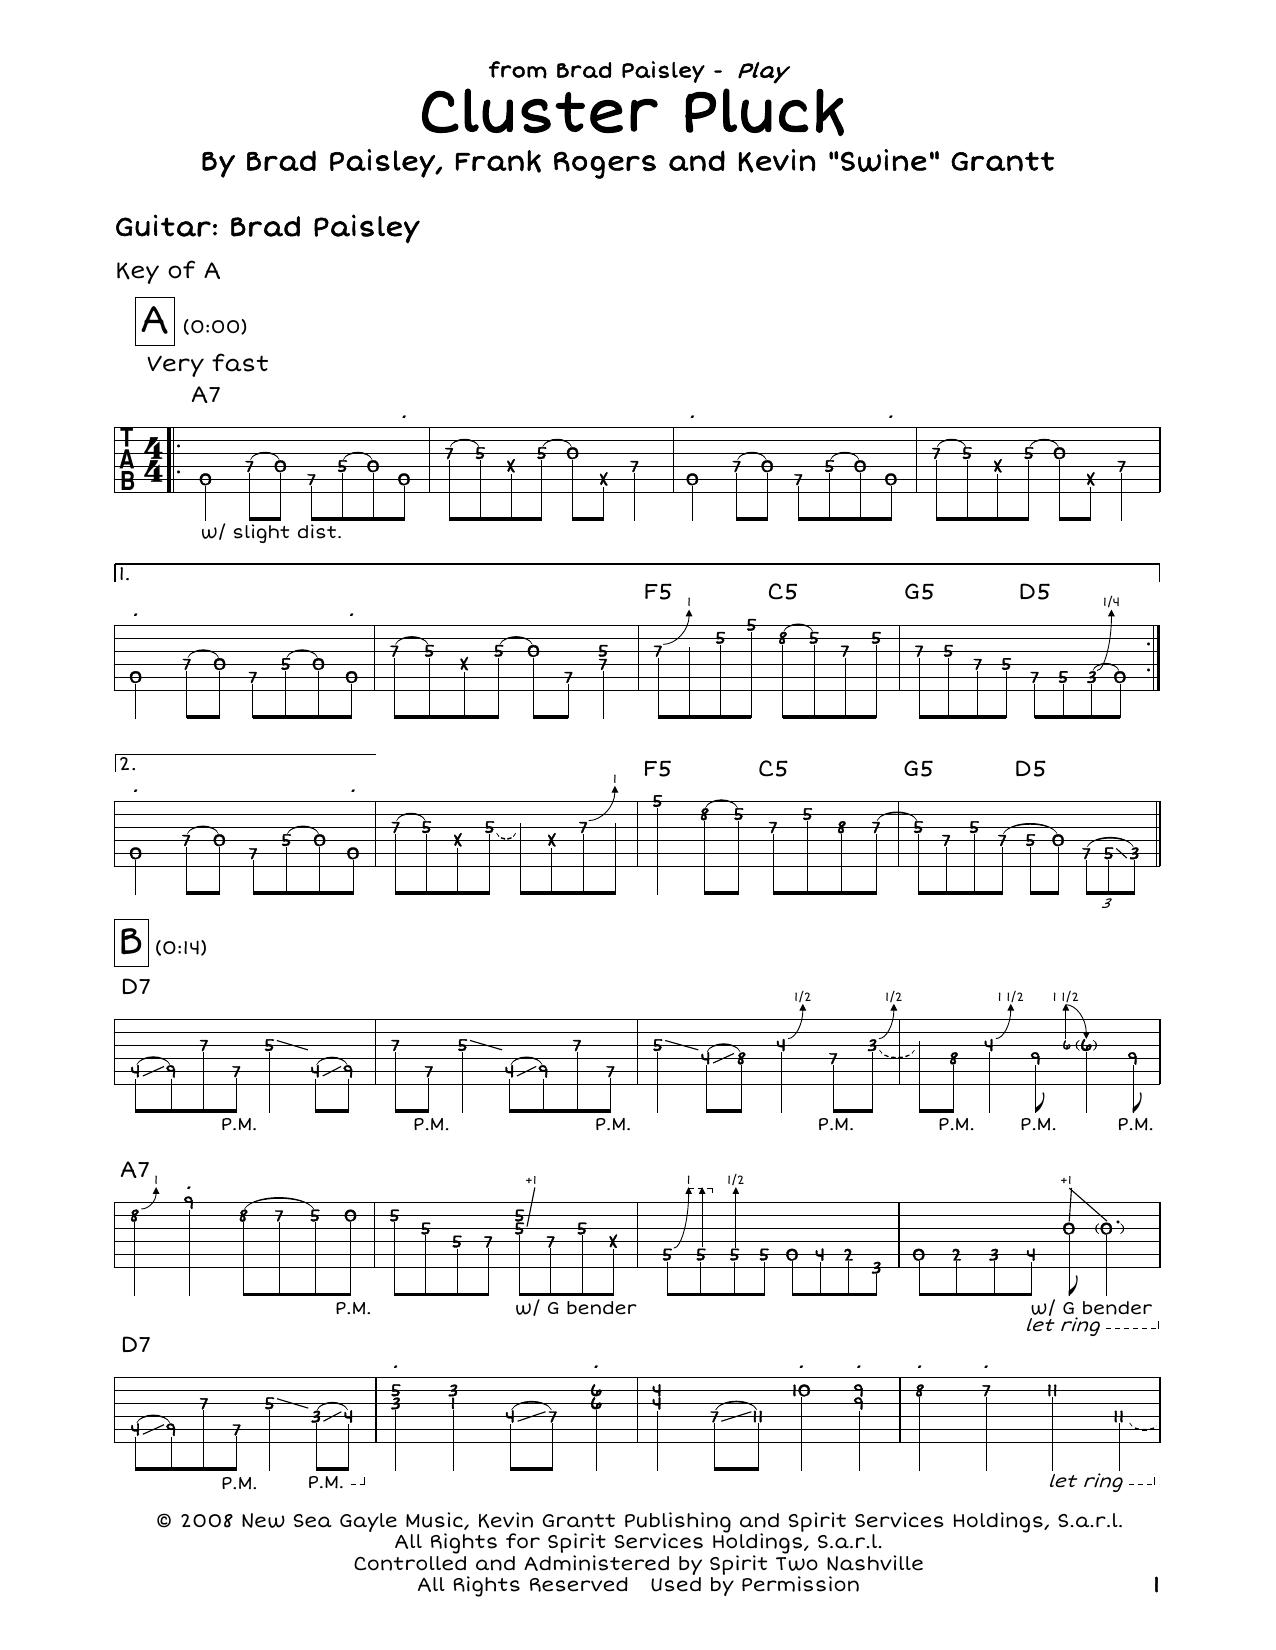 Cluster Pluck Sheet Music